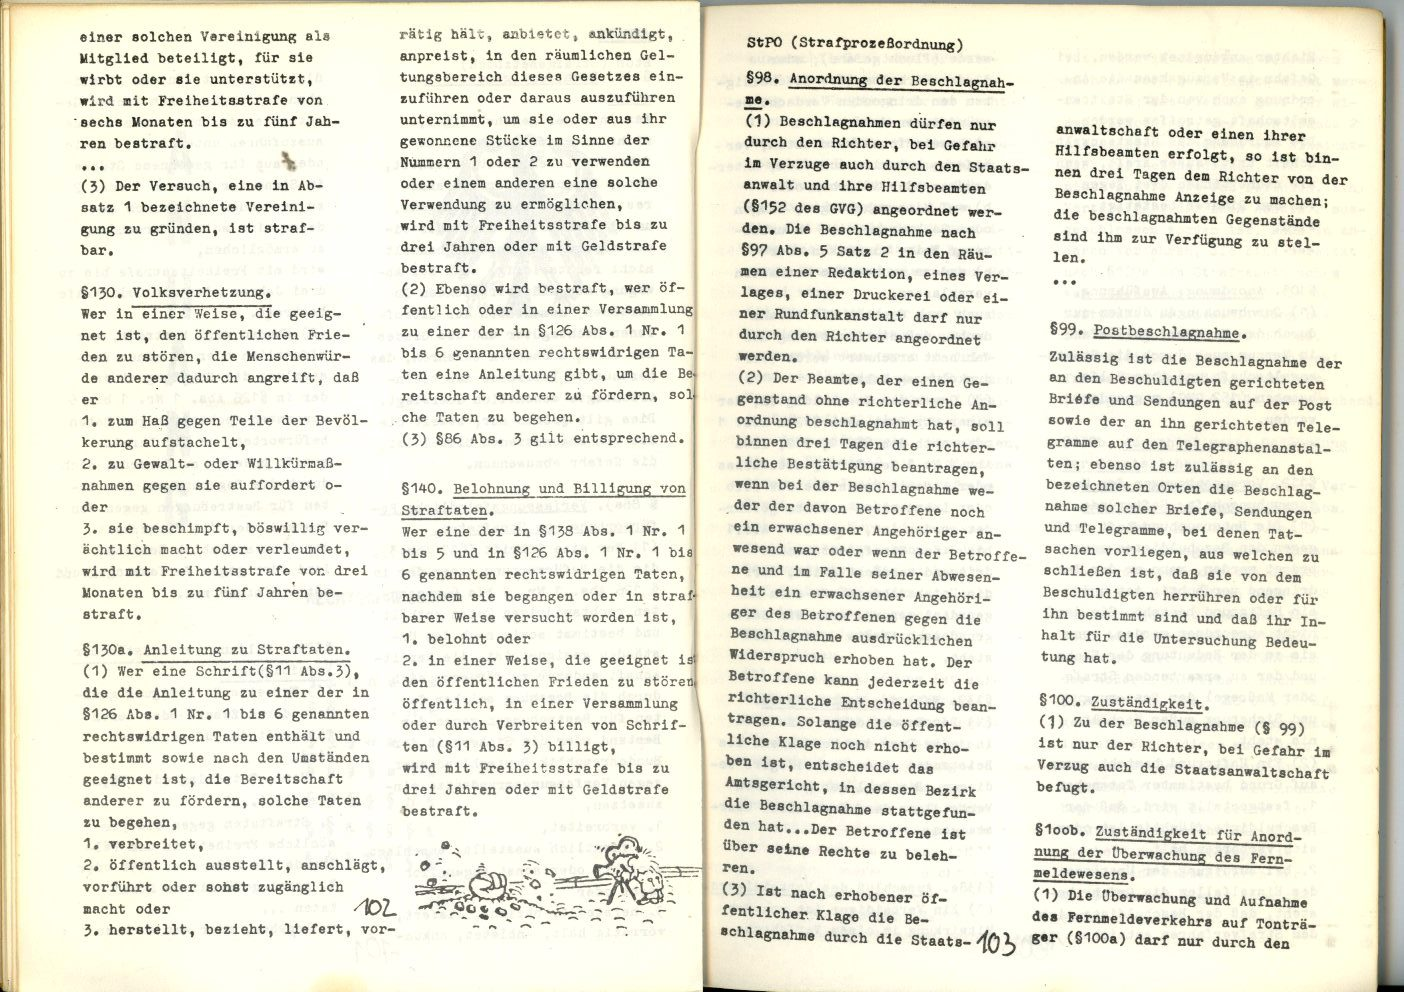 Marburg_Russell_Initiative_1978_53